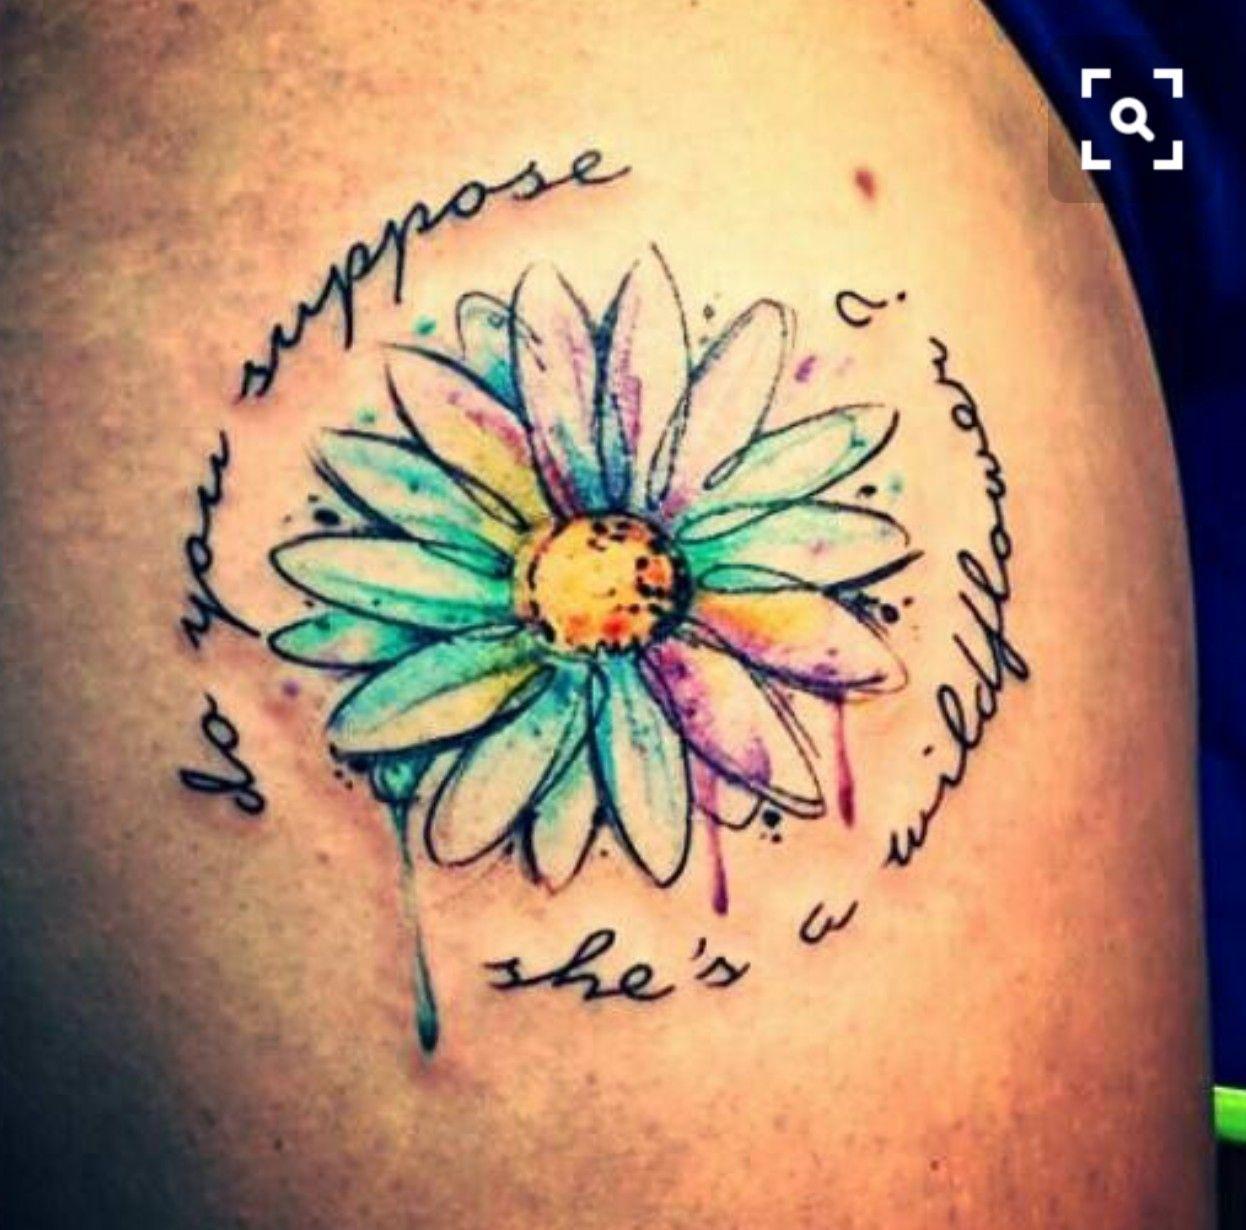 Pin by Sally Robbins on Tattoos Daisy tattoo, Tattoos